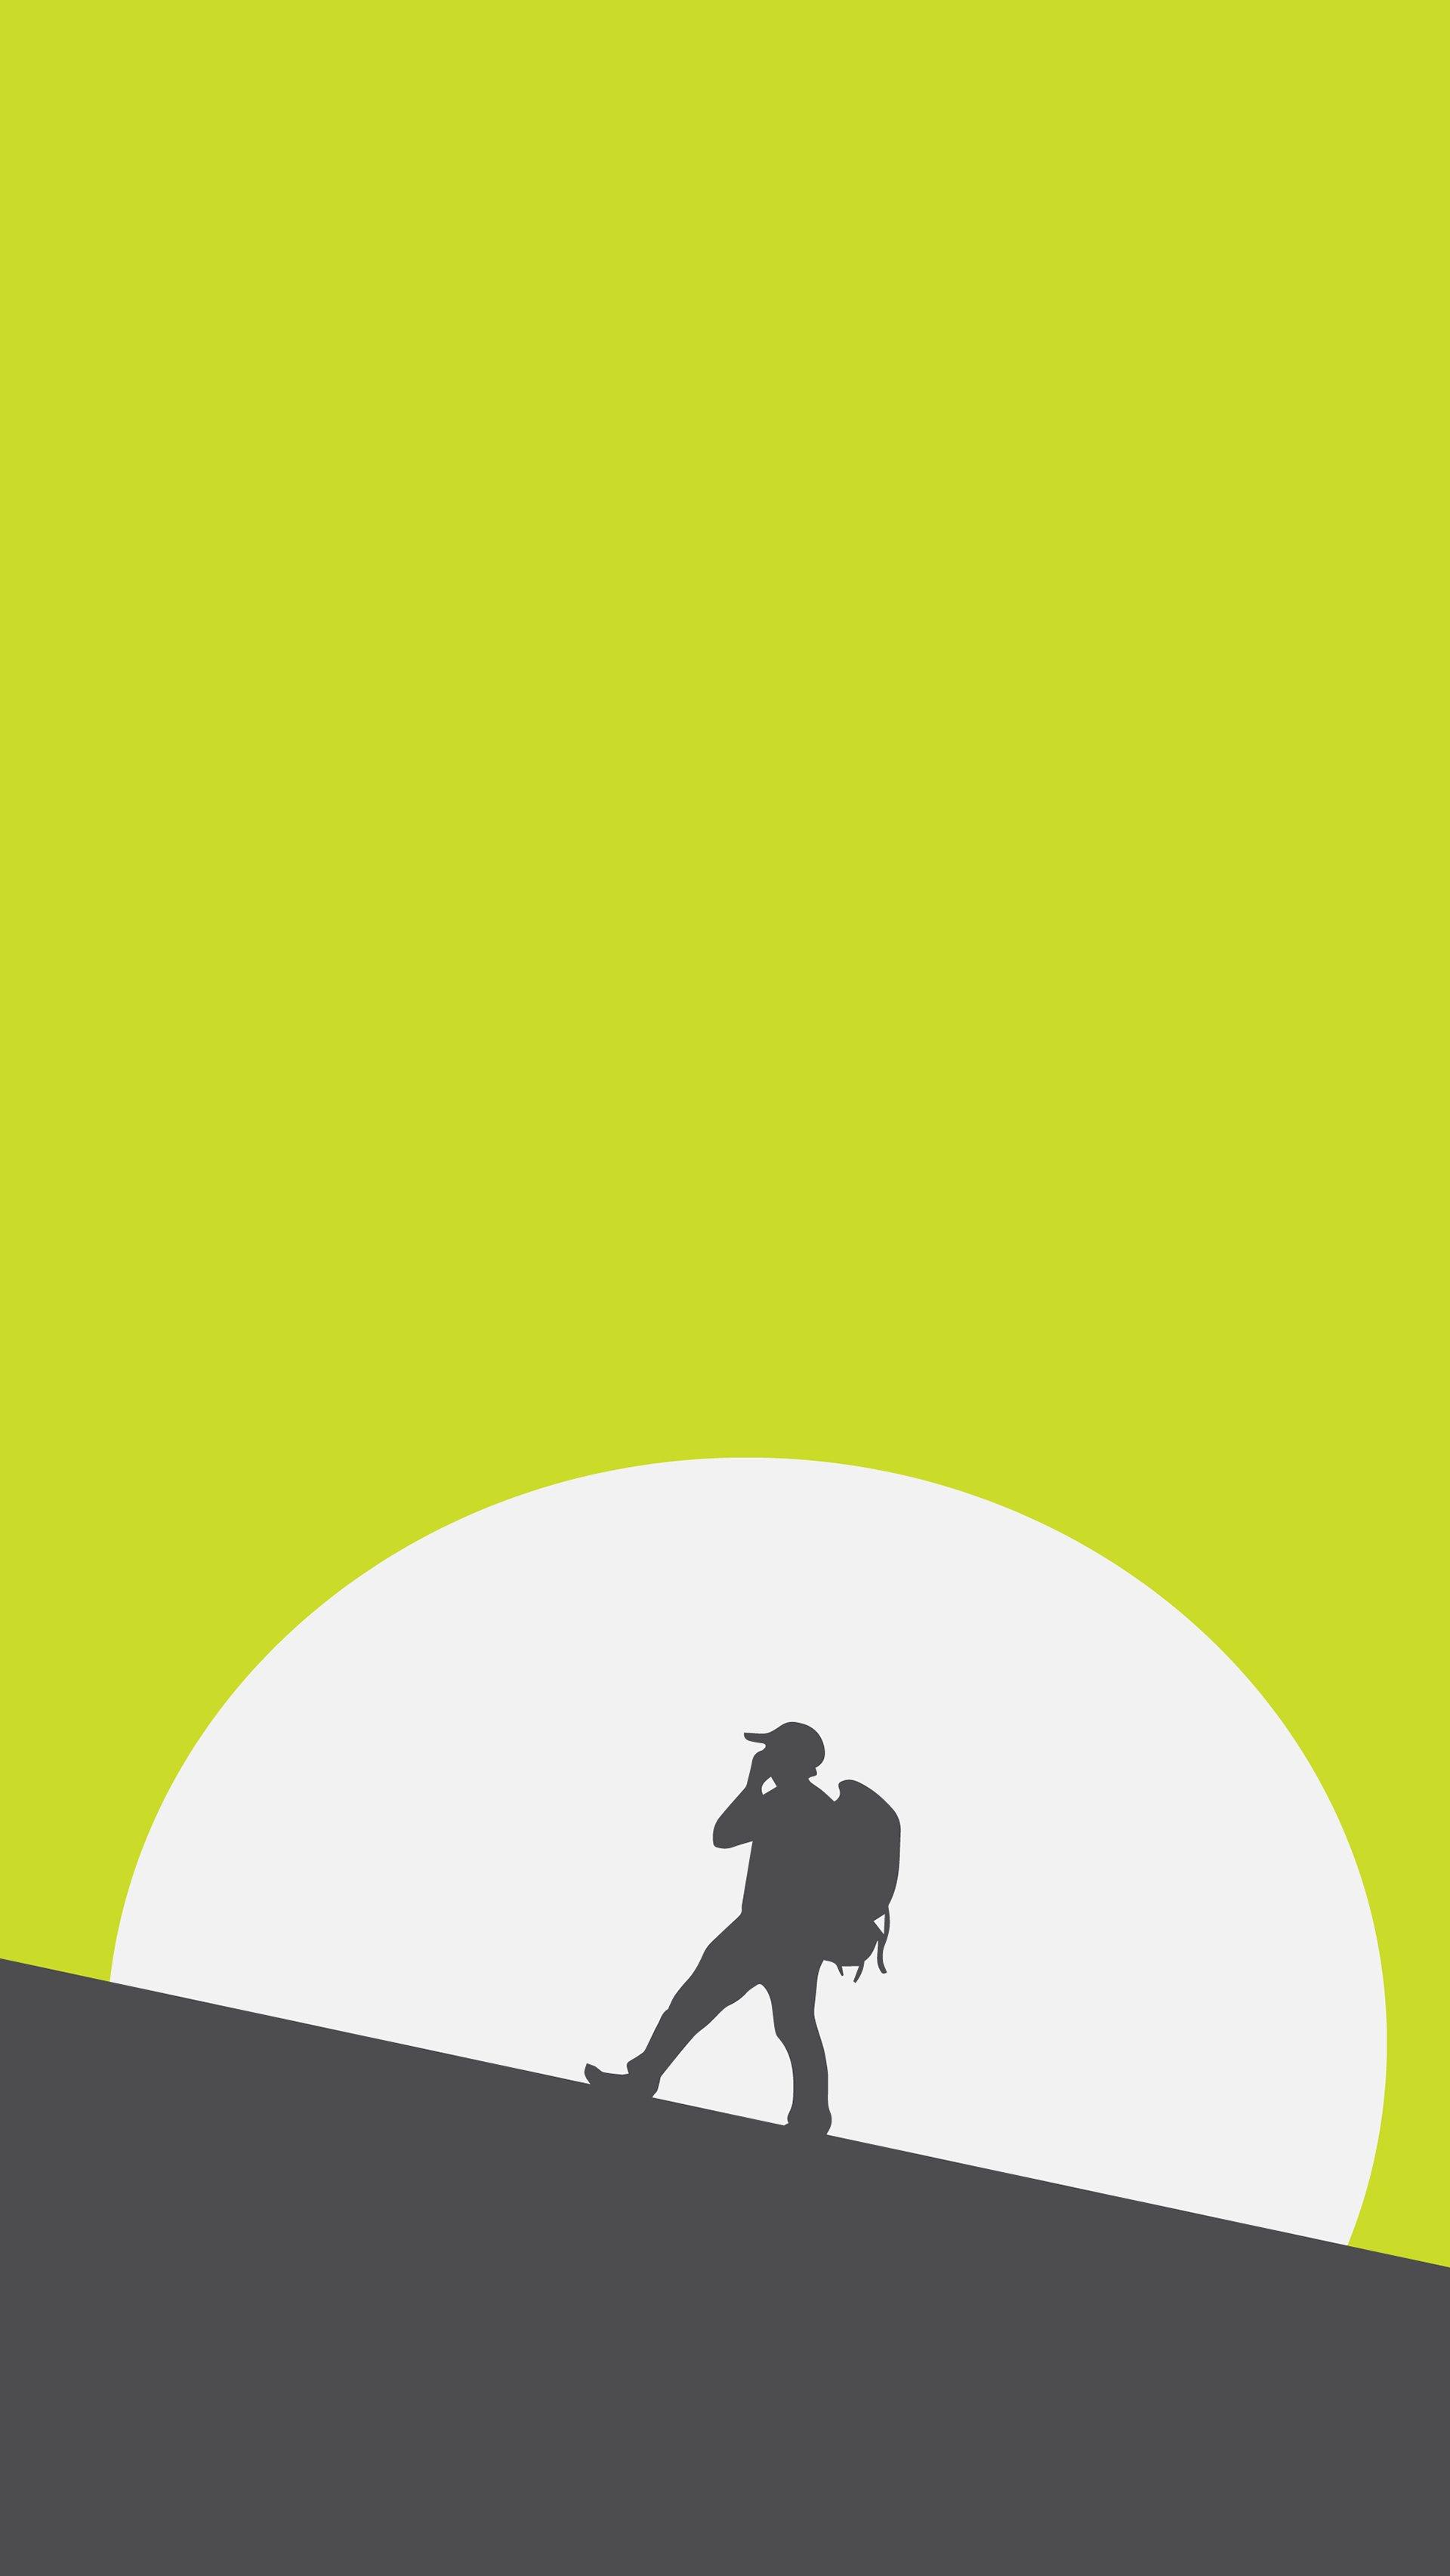 Climber Man iPhone Wallpaper